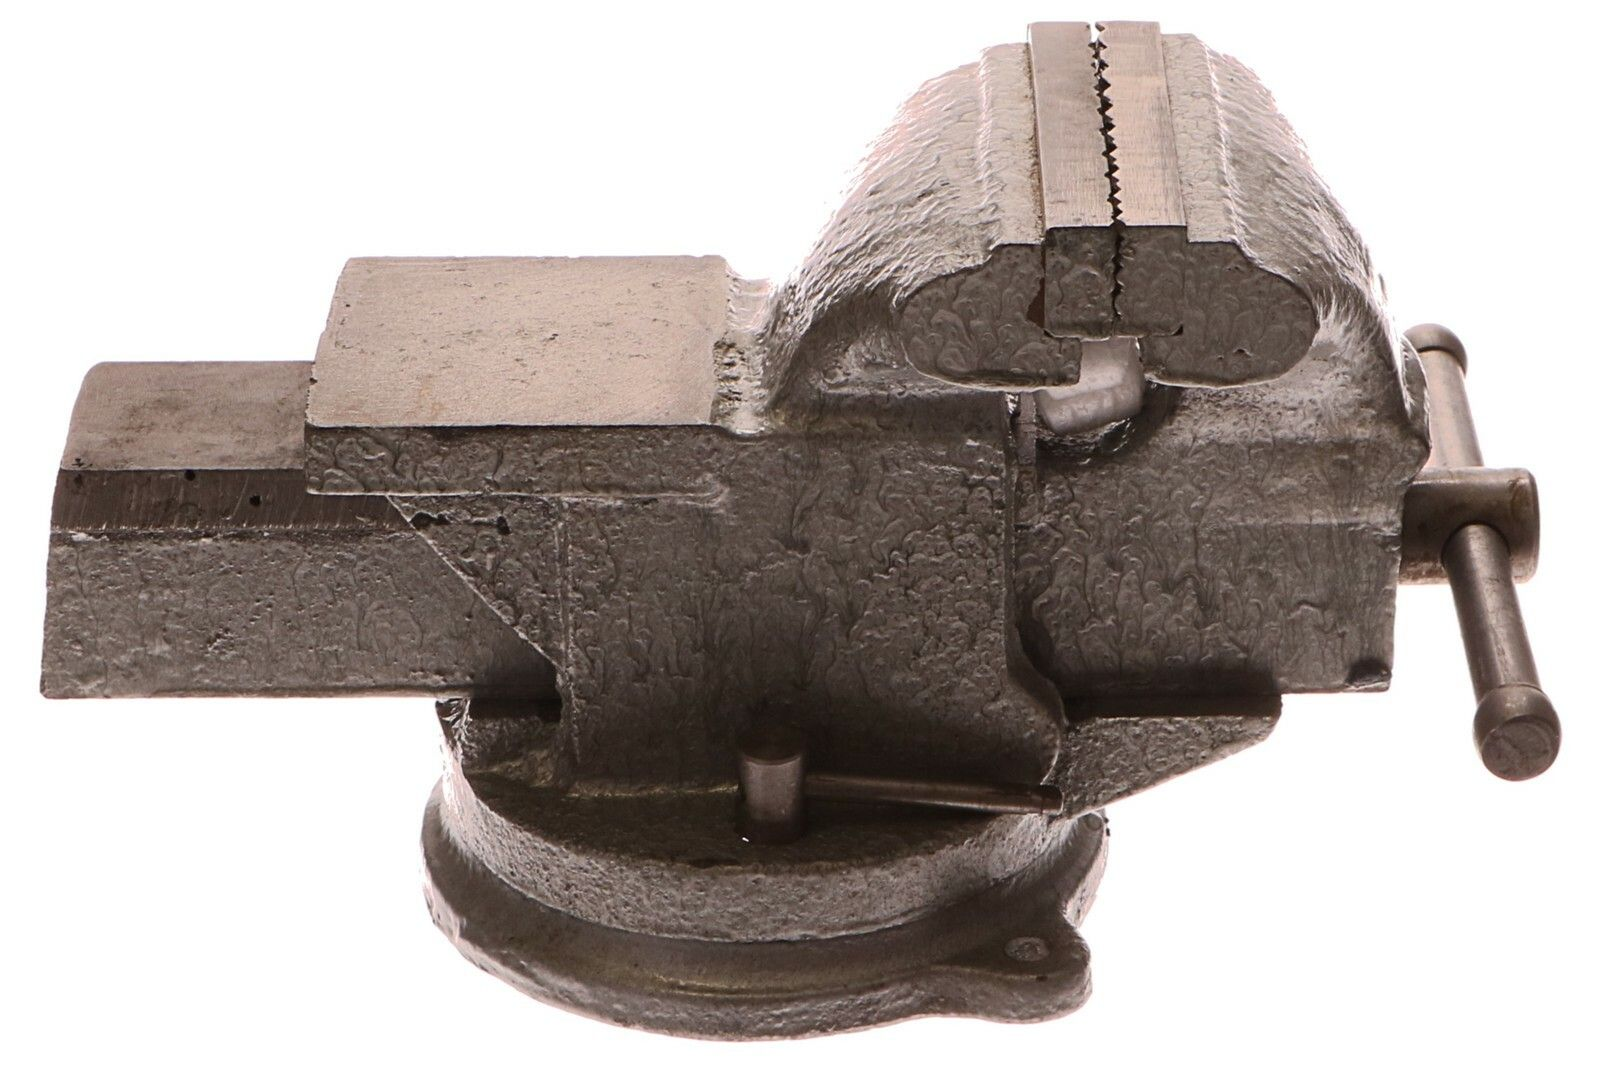 "GEKO G02301 Svěrák otočný s kovadlinou, 100mm/4"", 7,5kg"